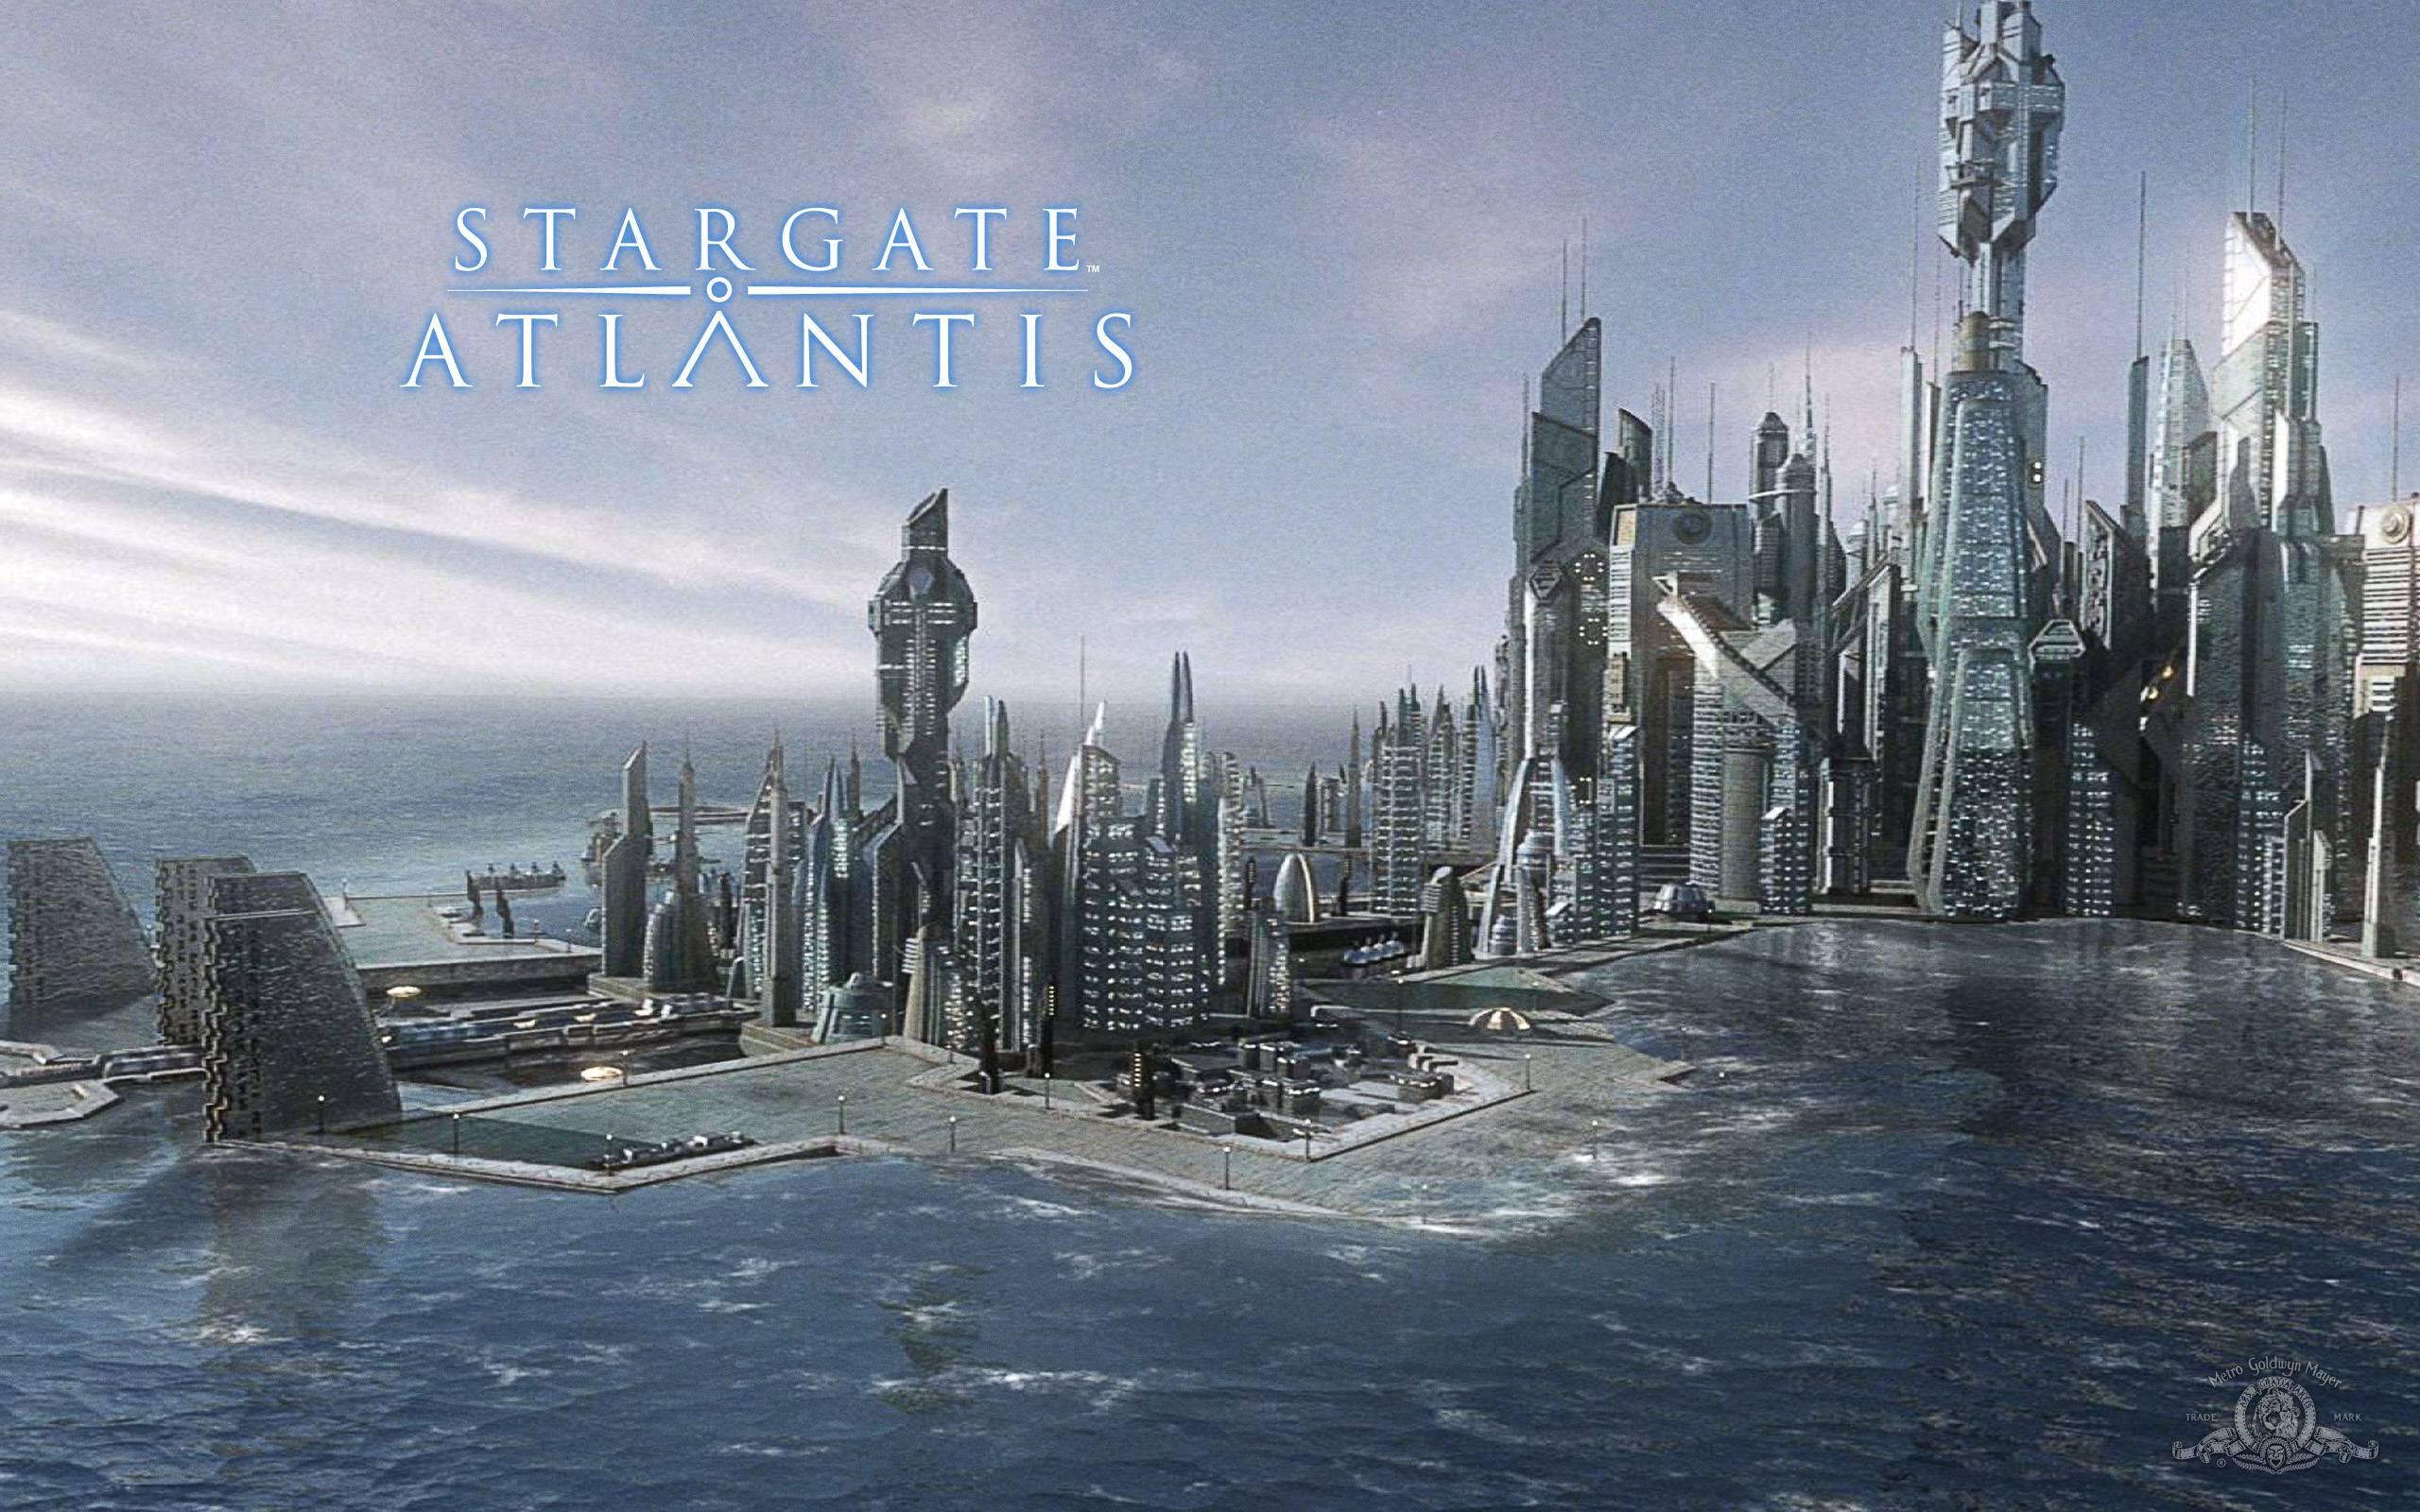 stargate atlantis wallpaper widescreen - photo #19